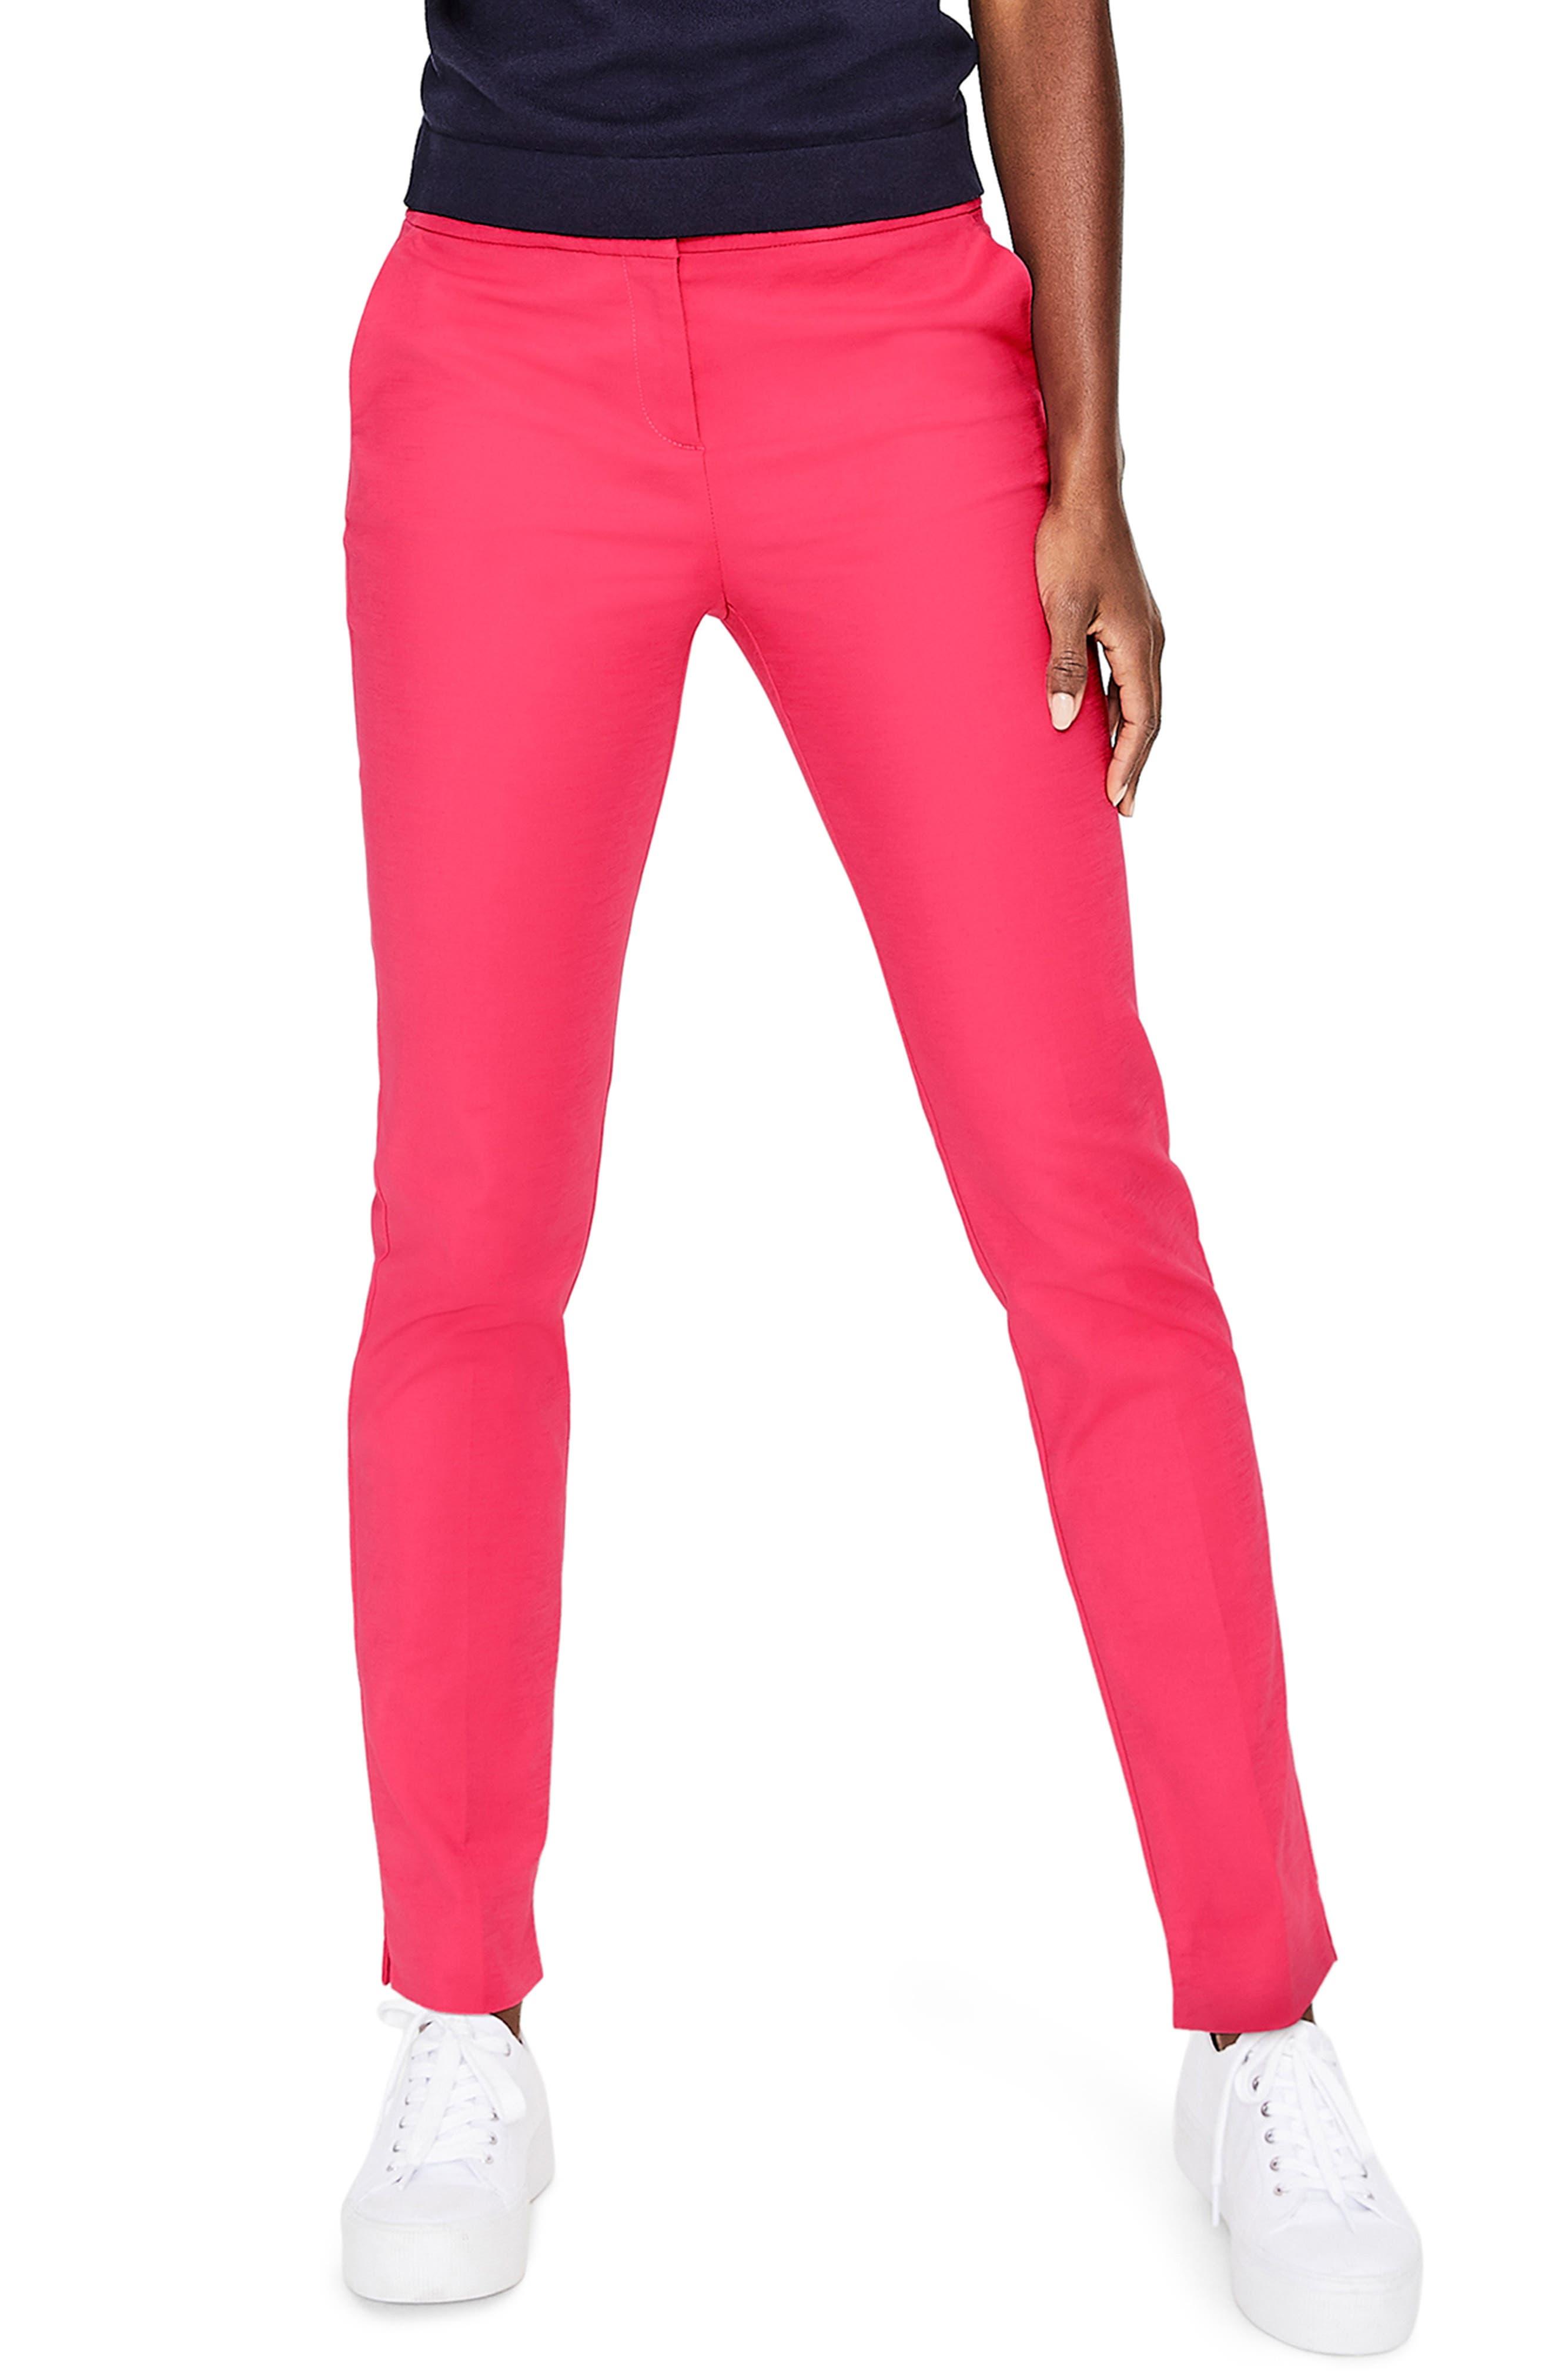 BODEN,                             Richmond Stretch Cotton Trousers,                             Main thumbnail 1, color,                             GARDEN ROSE